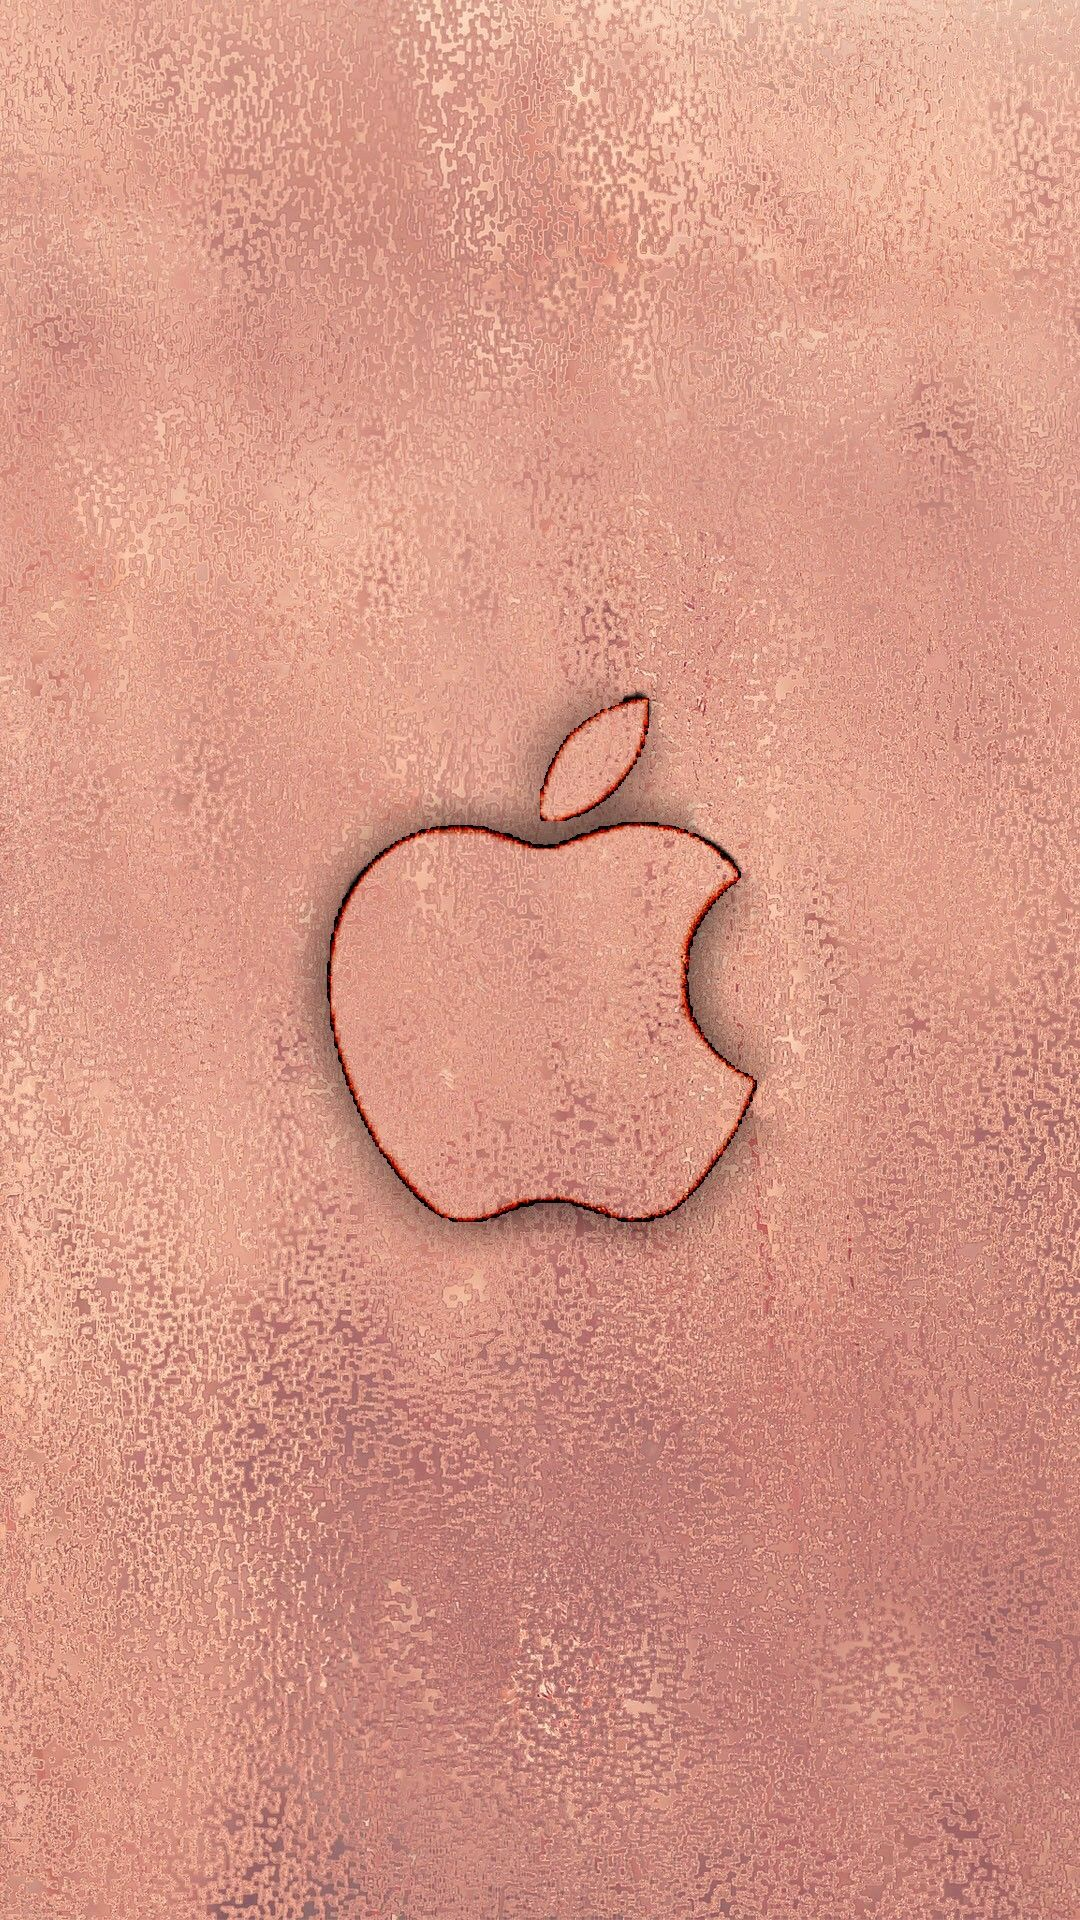 Wallpaper Apple Logo Wallpaper Iphone Apple Wallpaper Iphone Apple Iphone Wallpaper Hd